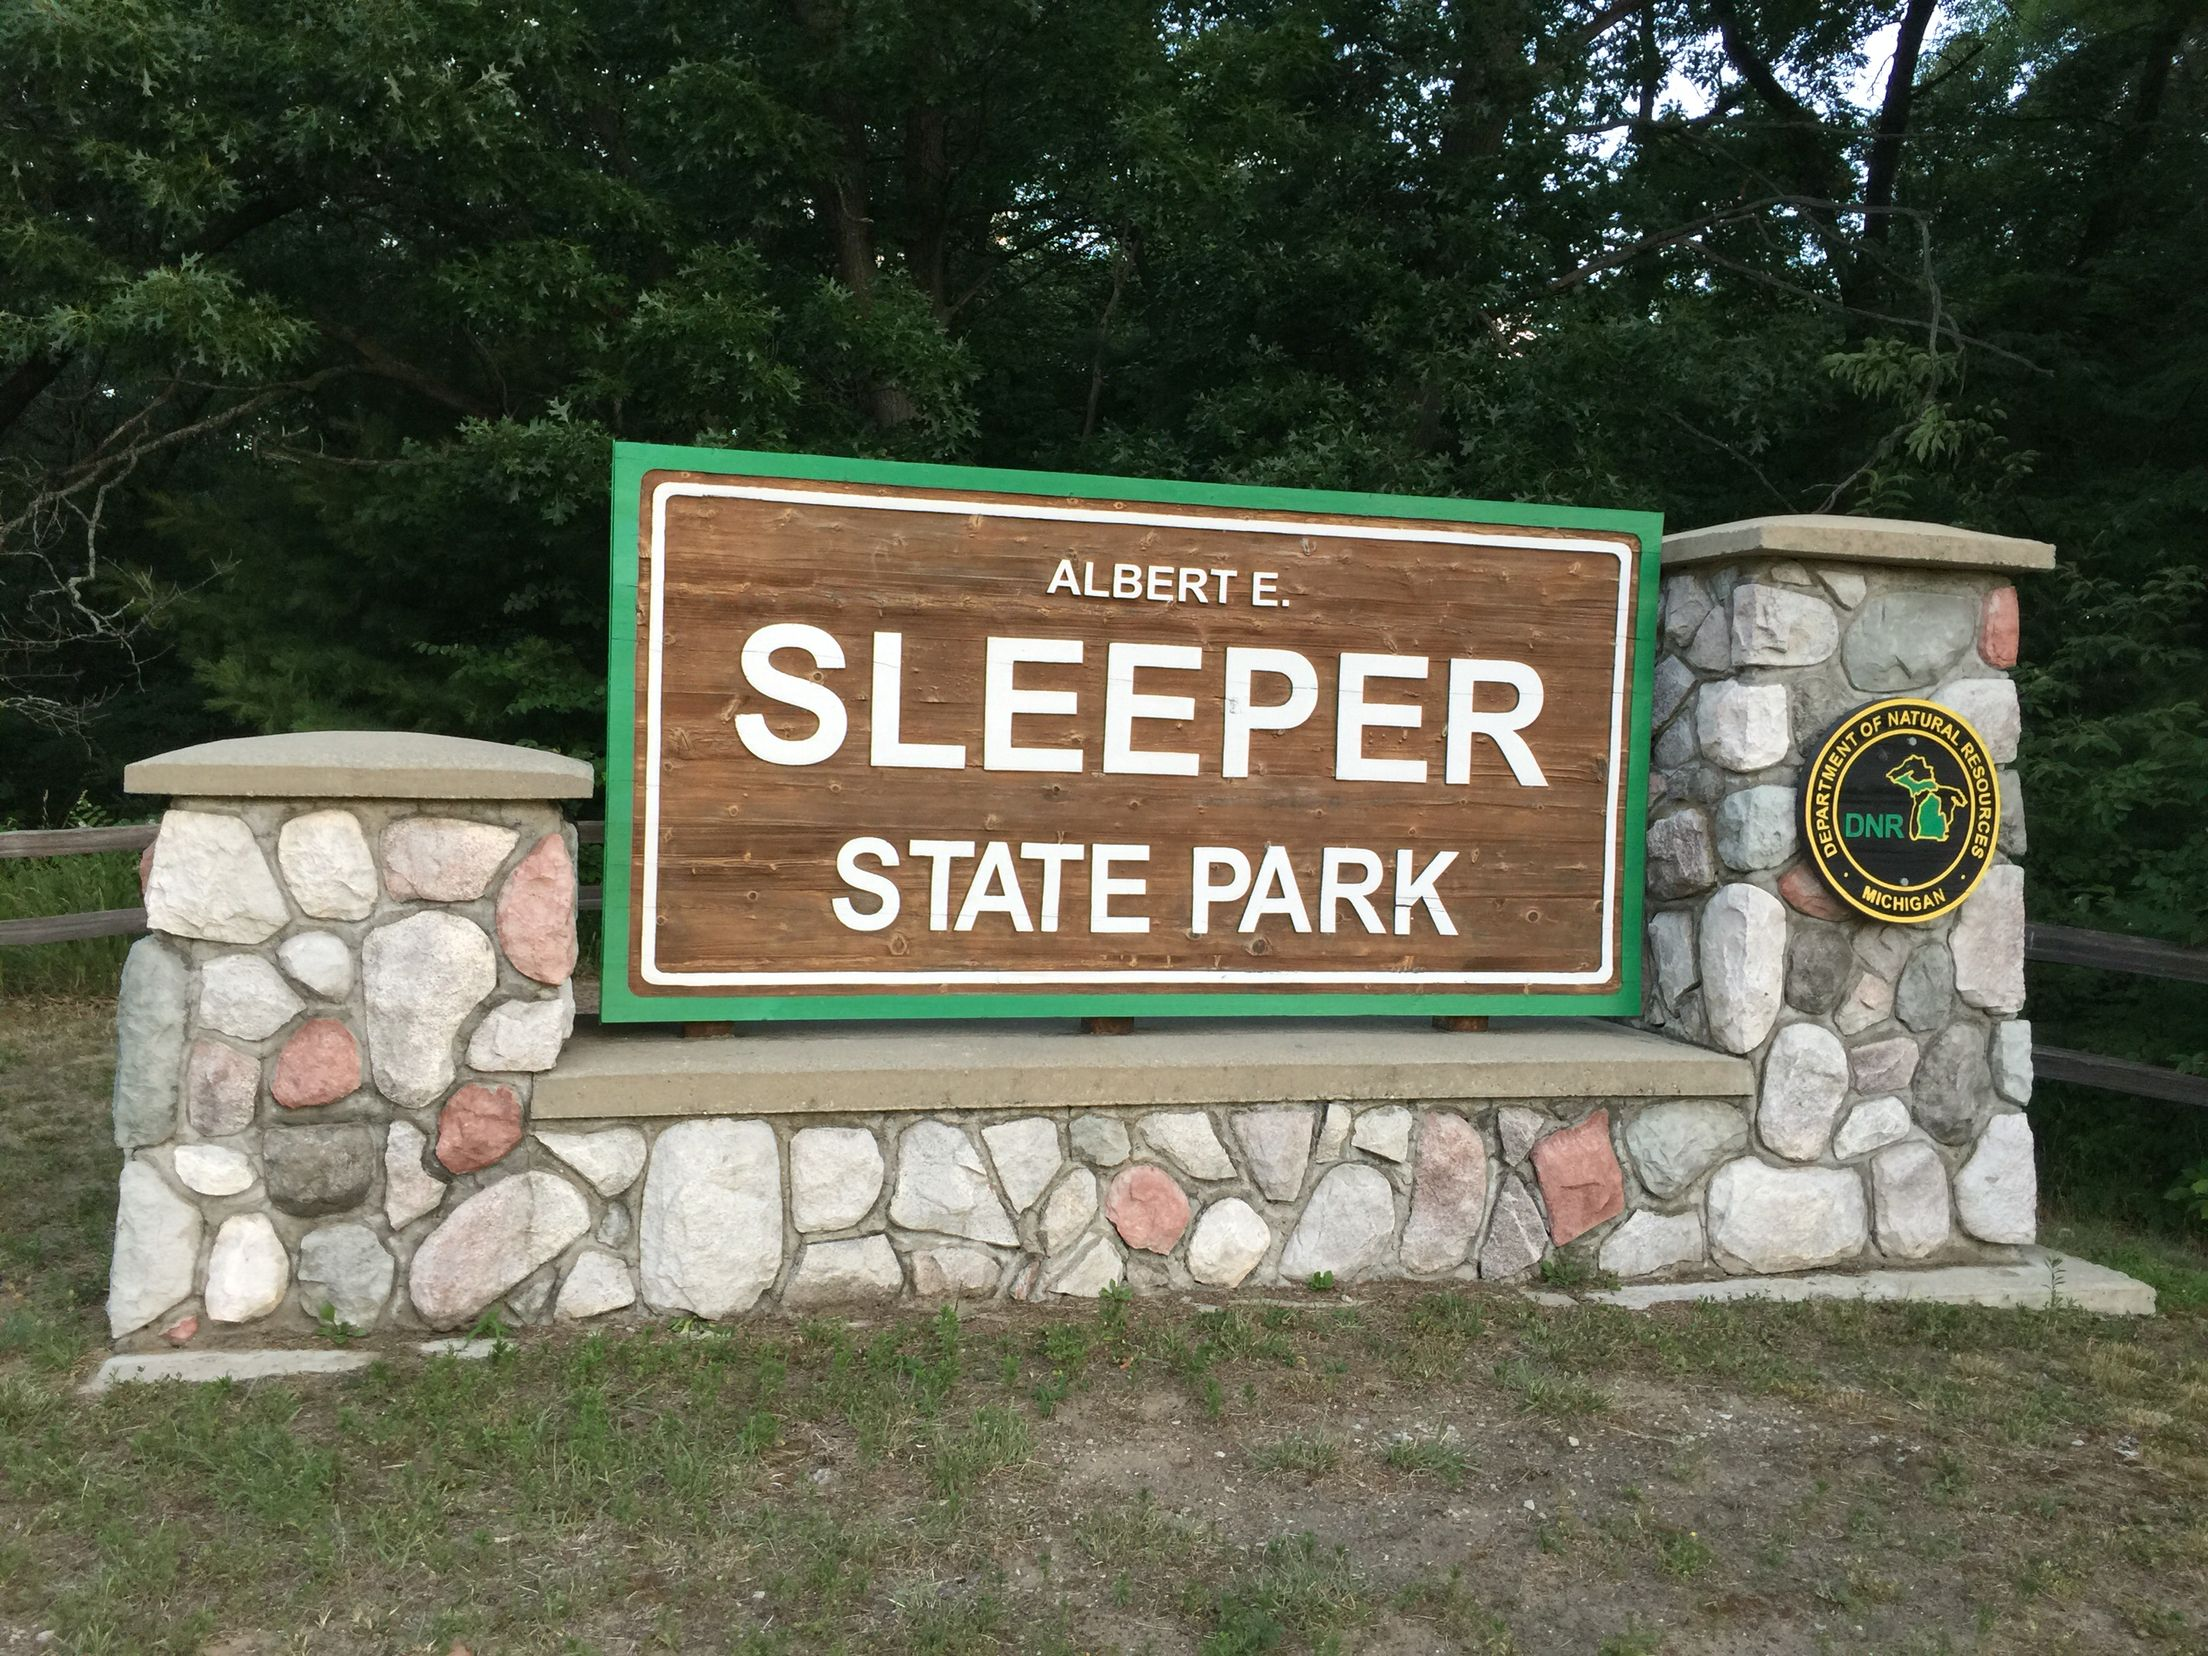 Elbert E. Sleeper state park caseville Michigan camping, Lake Huron, Great  Lake, Michigan thumb, Michigan state park